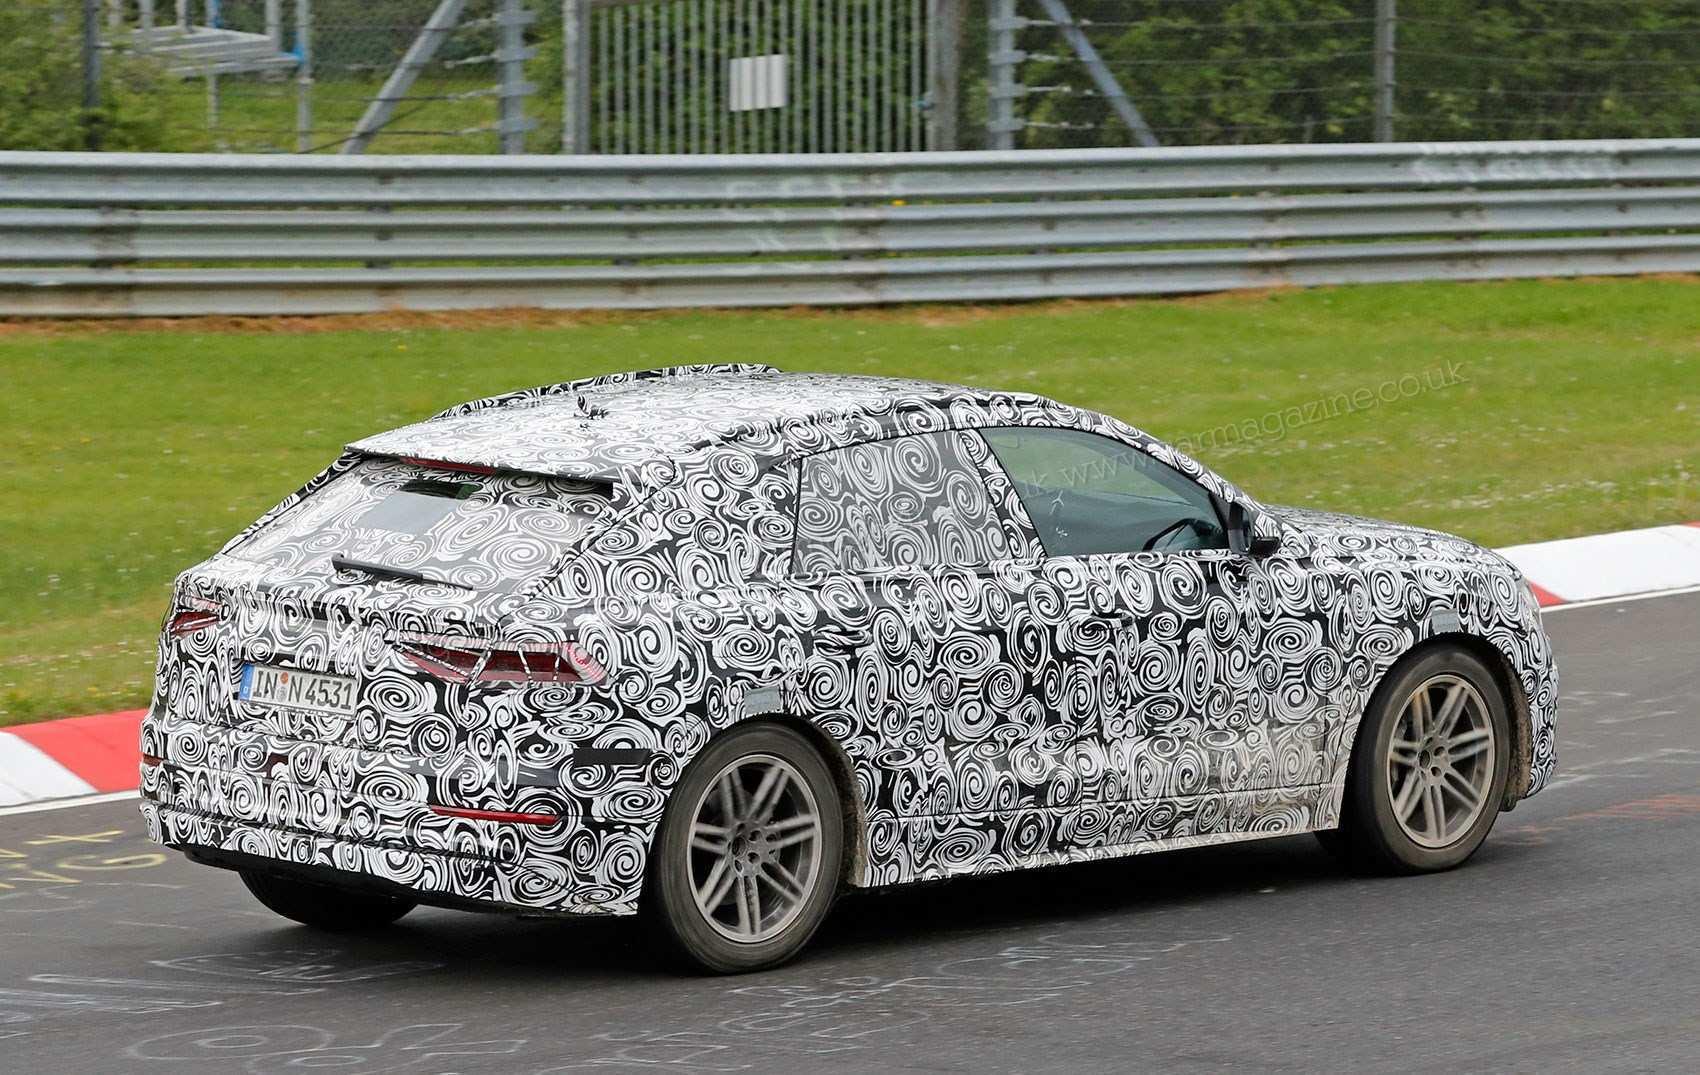 71 Concept of Audi Modellen 2020 First Drive for Audi Modellen 2020